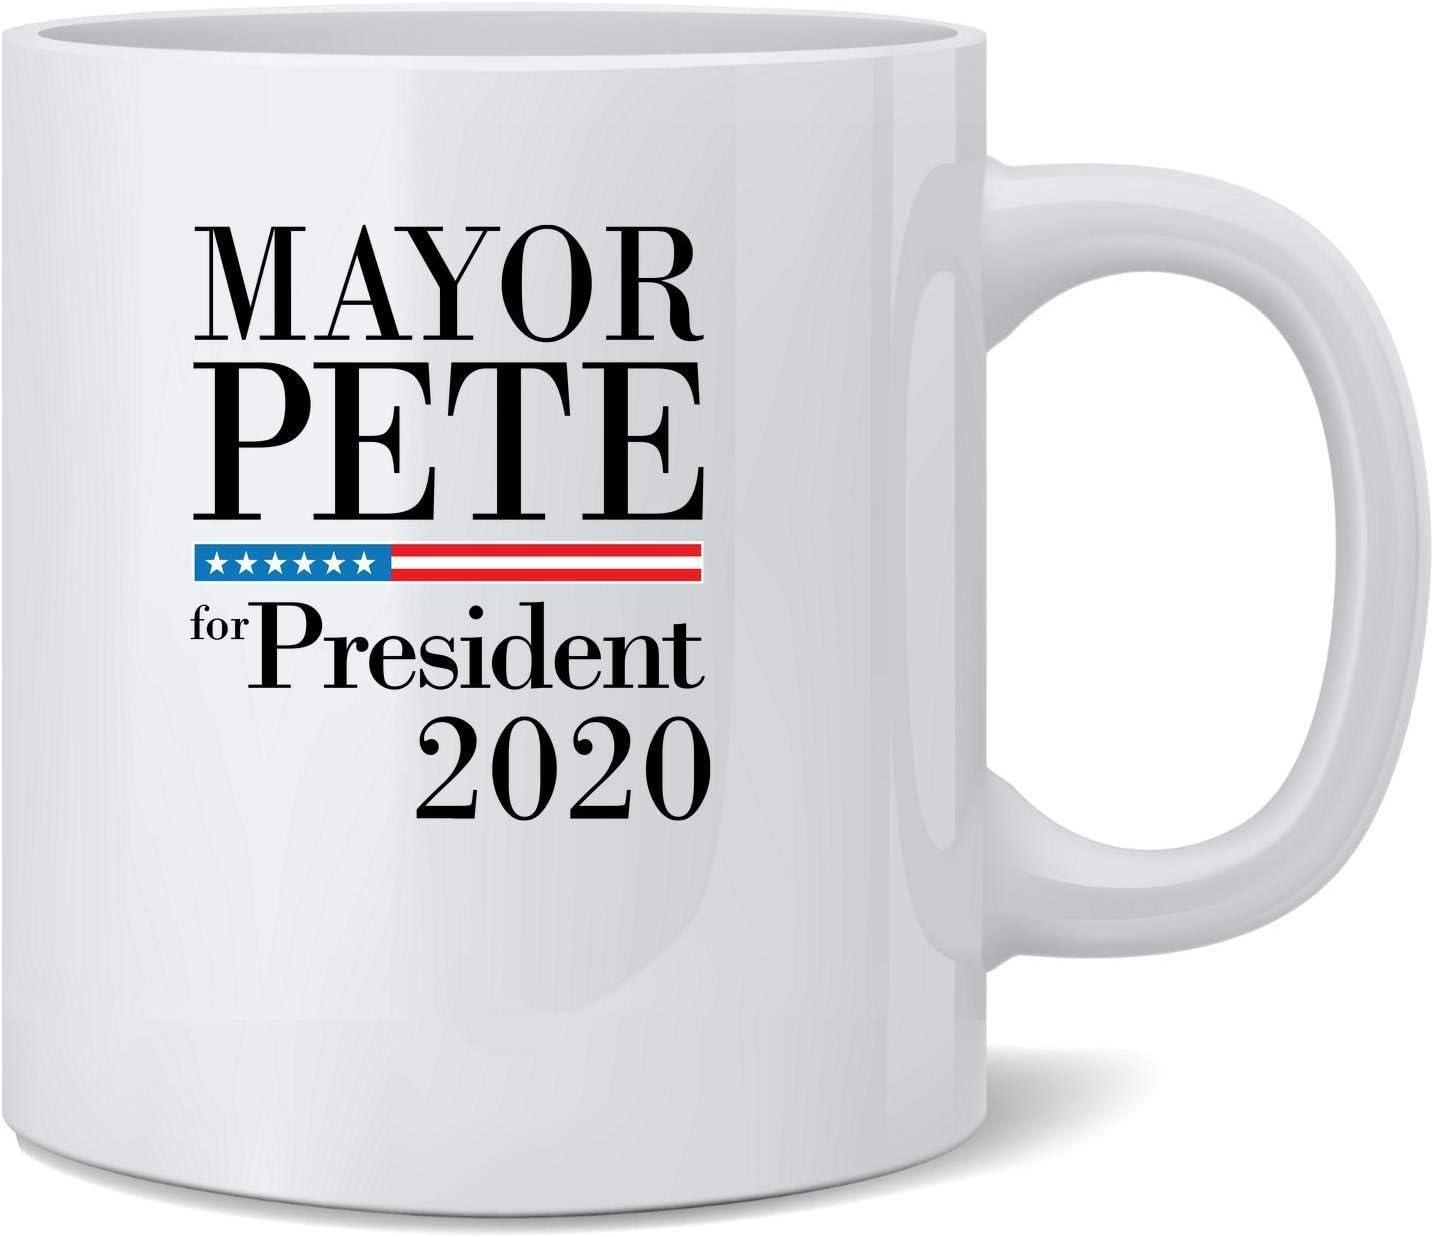 Poster Foundry Mayor Pete for President Buttigieg 2020 Campaign Ceramic Coffee Mug Tea Cup Fun Novelty Gift 12 oz